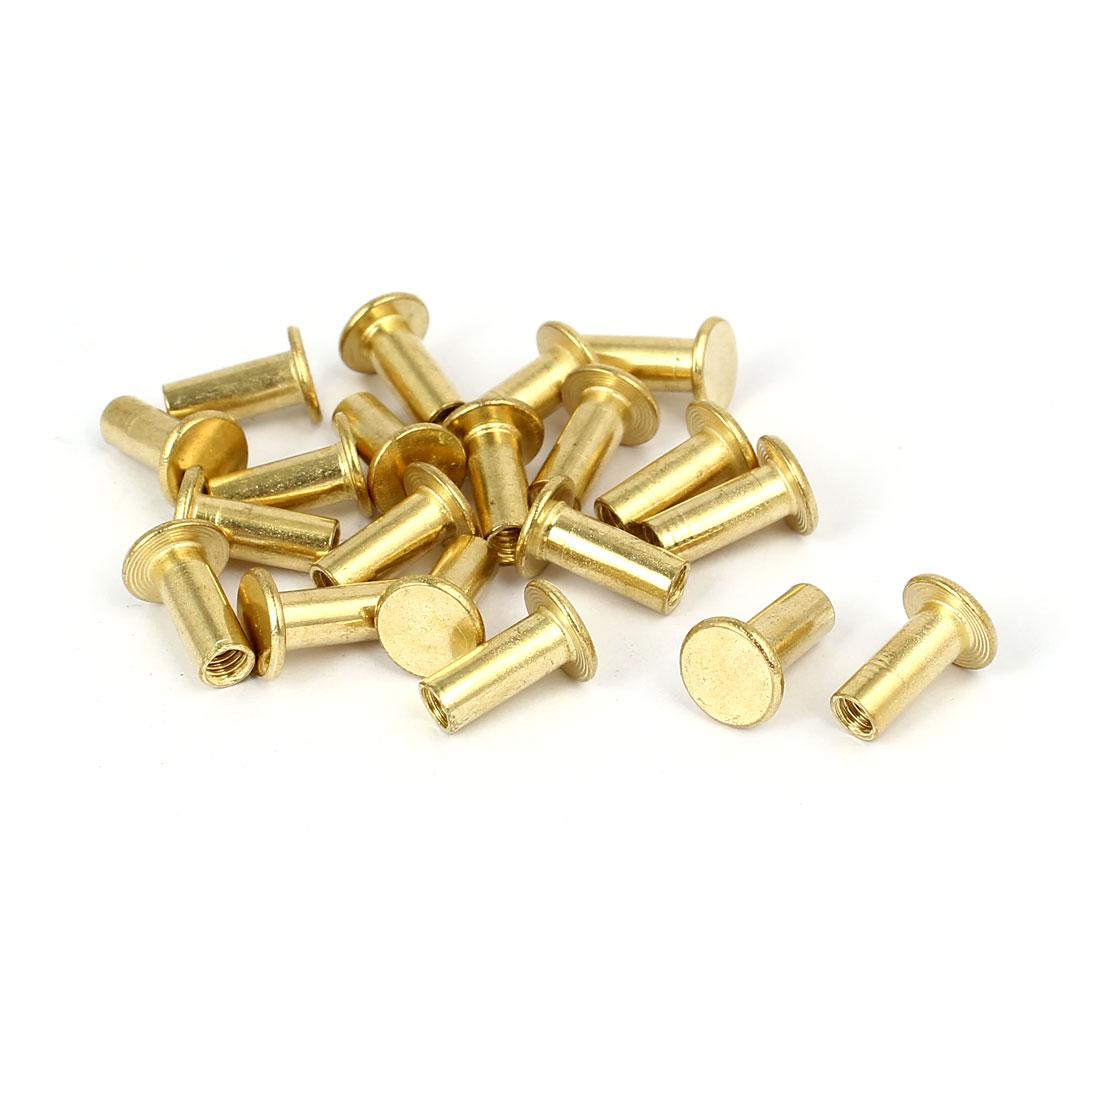 Photo Album Metal Brass Plated Binding Screw Post Barrel Nut 5mmx12mm 20pcs